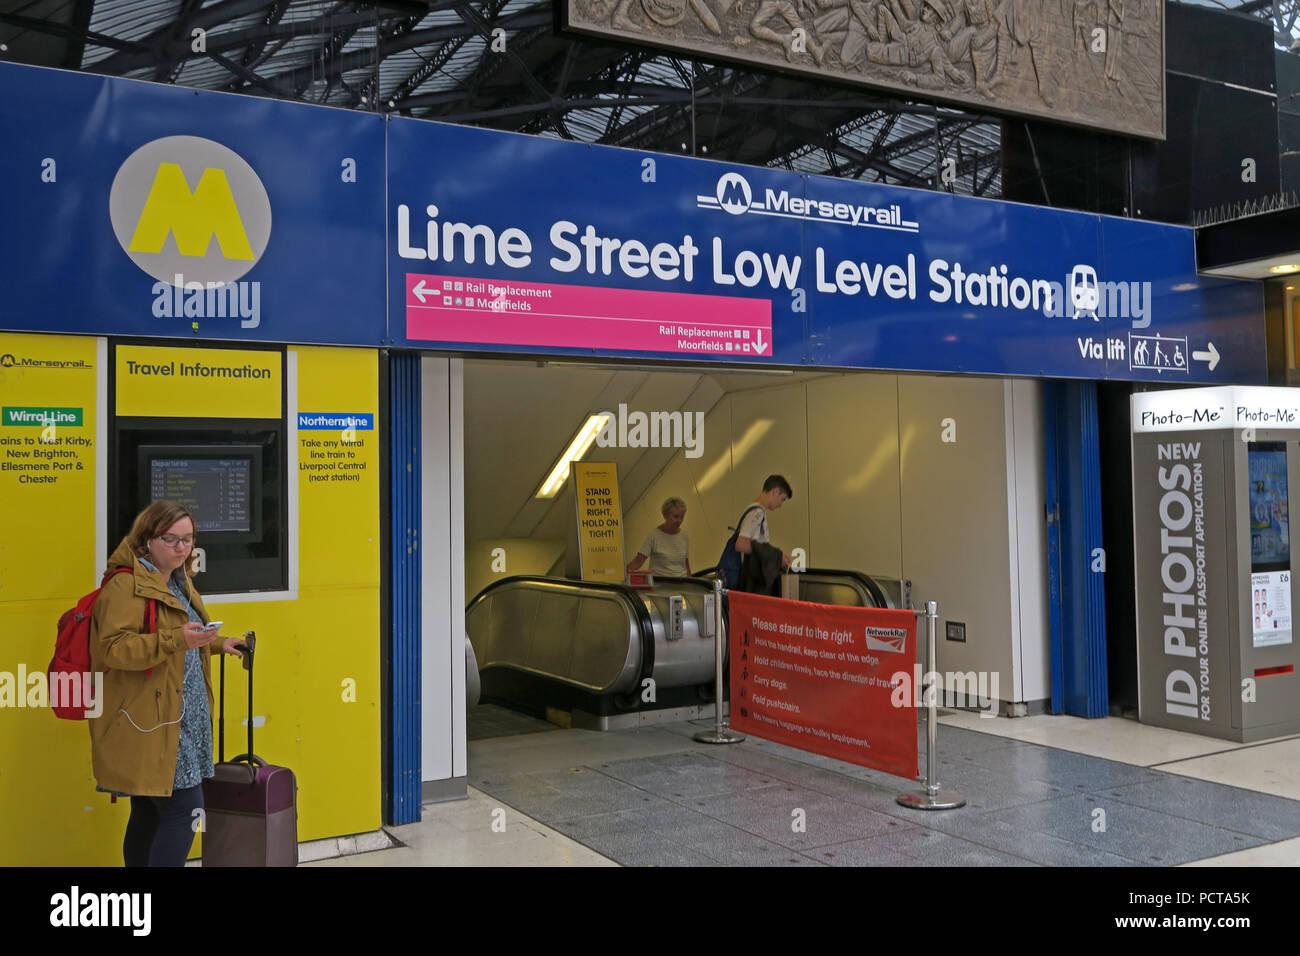 Laden Sie dieses Alamy Stockfoto Lime Street Low Level Bahnhof Eingang, Liverpool Lime Street, Merseyside, North West England, Großbritannien - PCTA5K